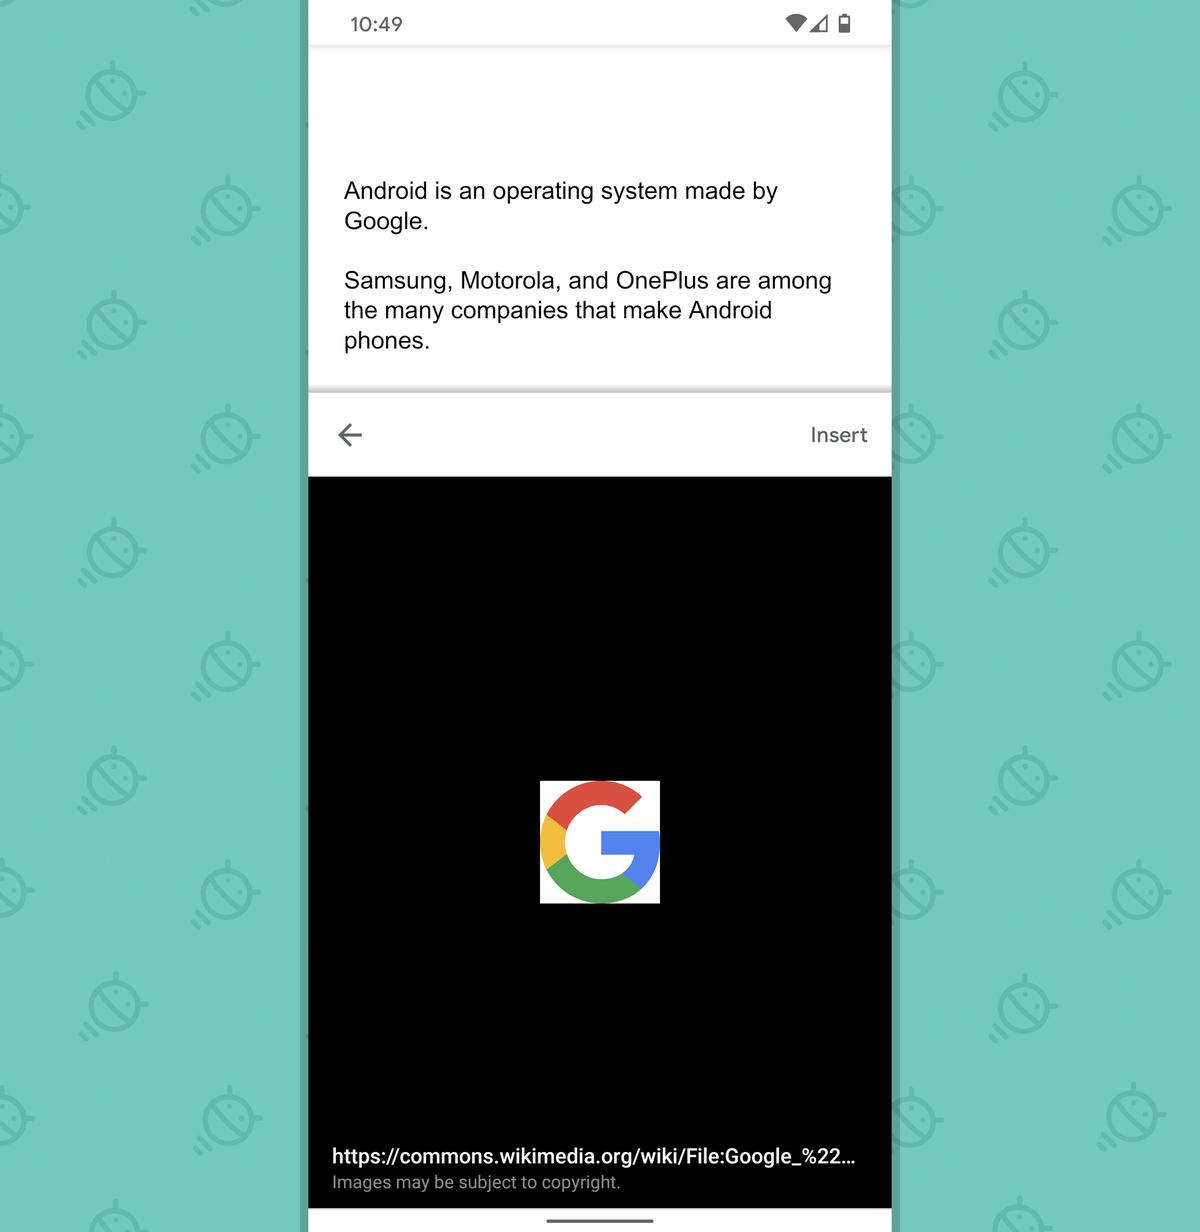 Google Docs Android: Explore - insert image